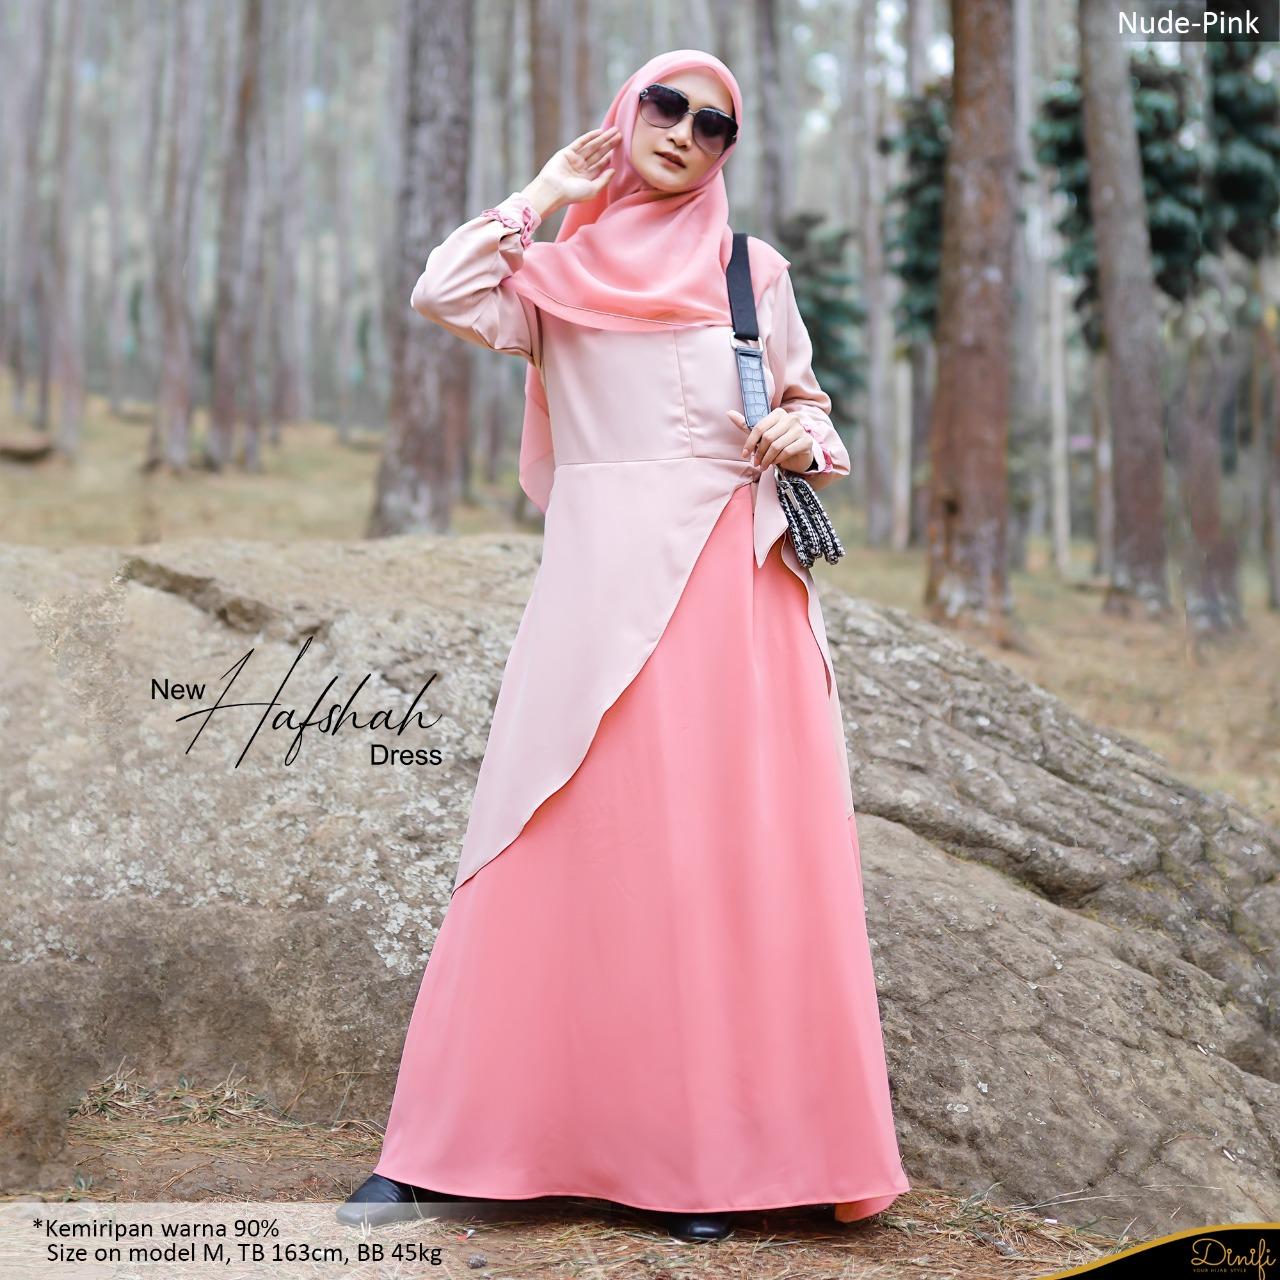 New Hafshah Dress